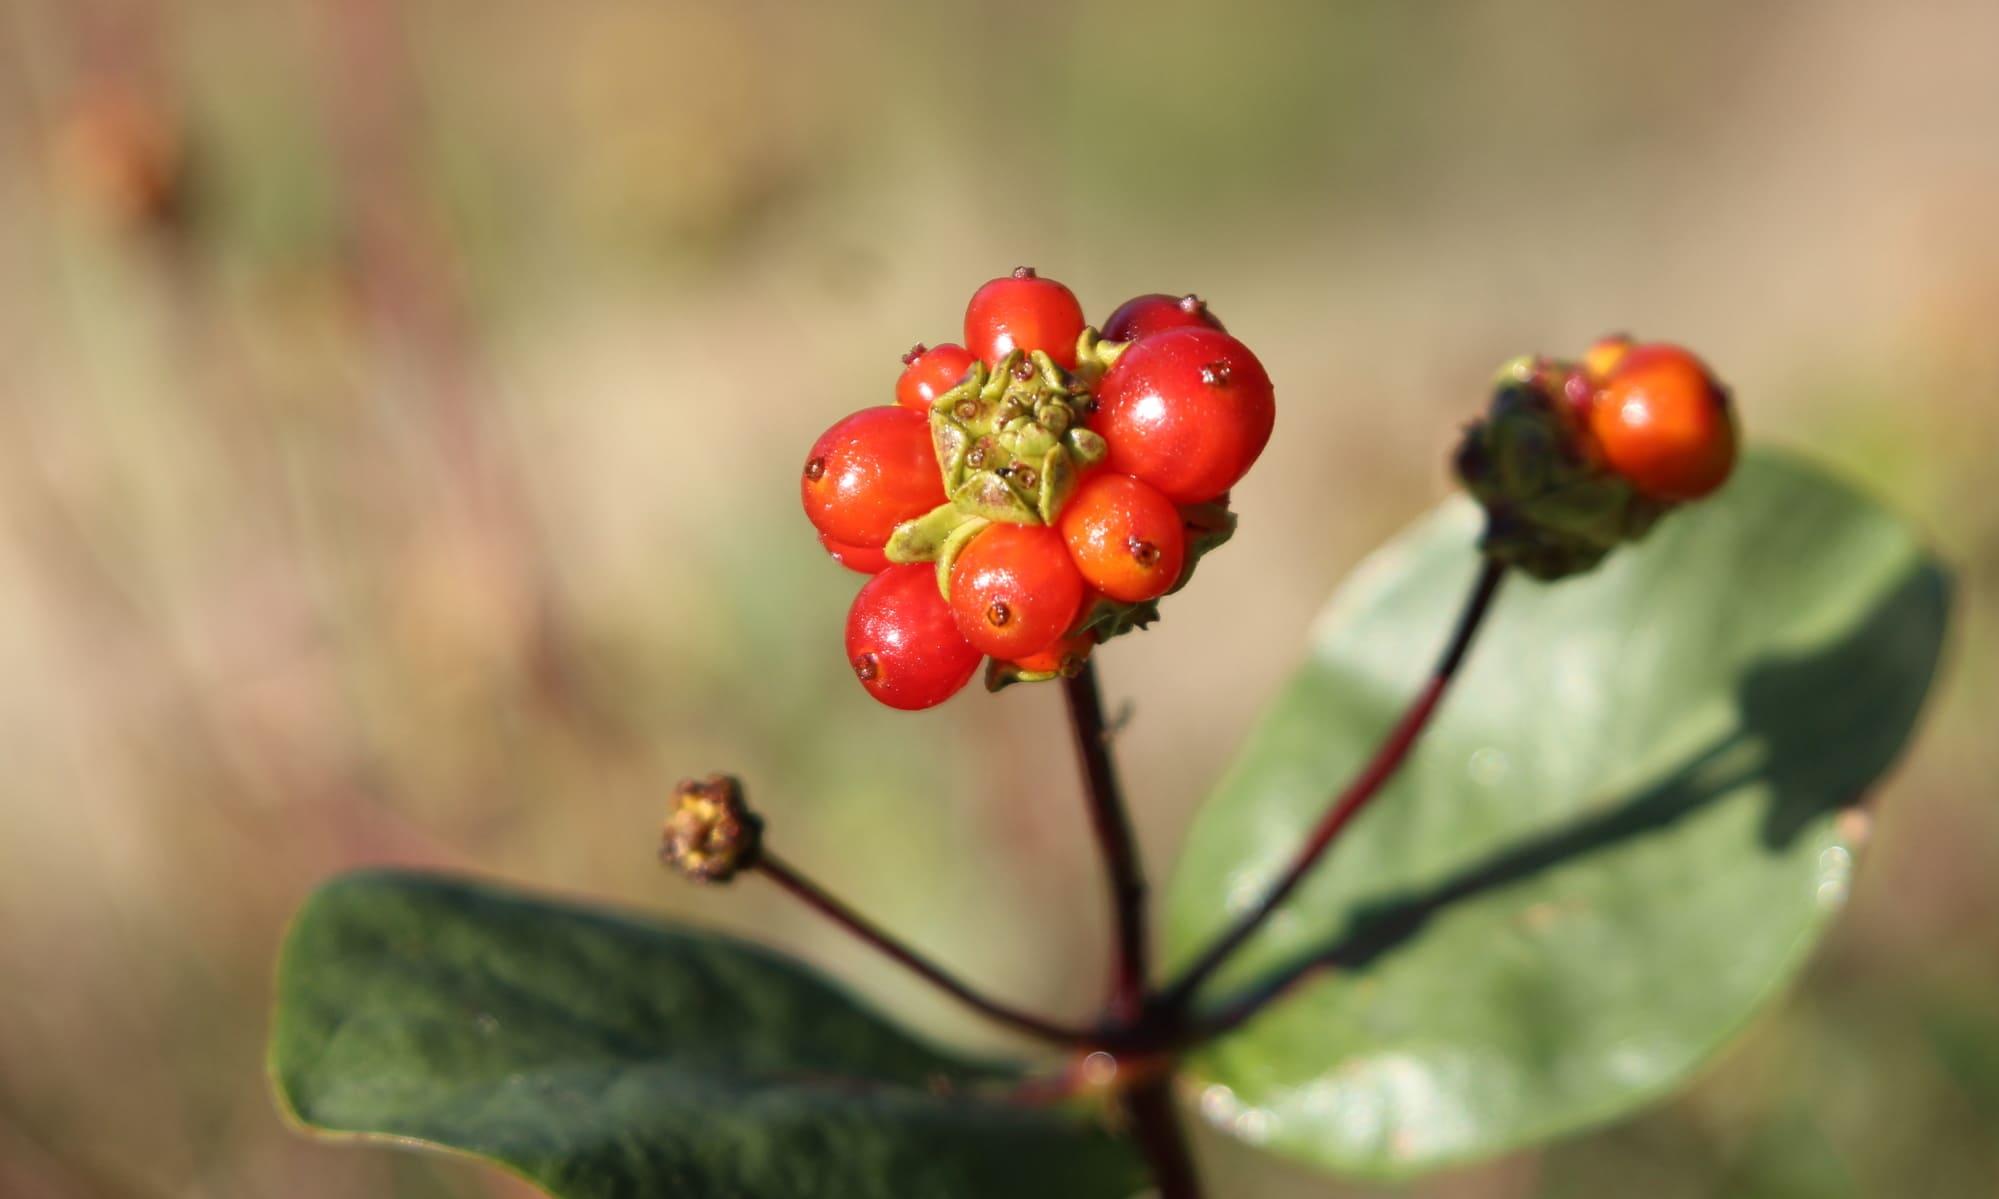 Fruto madreselva de los bosques